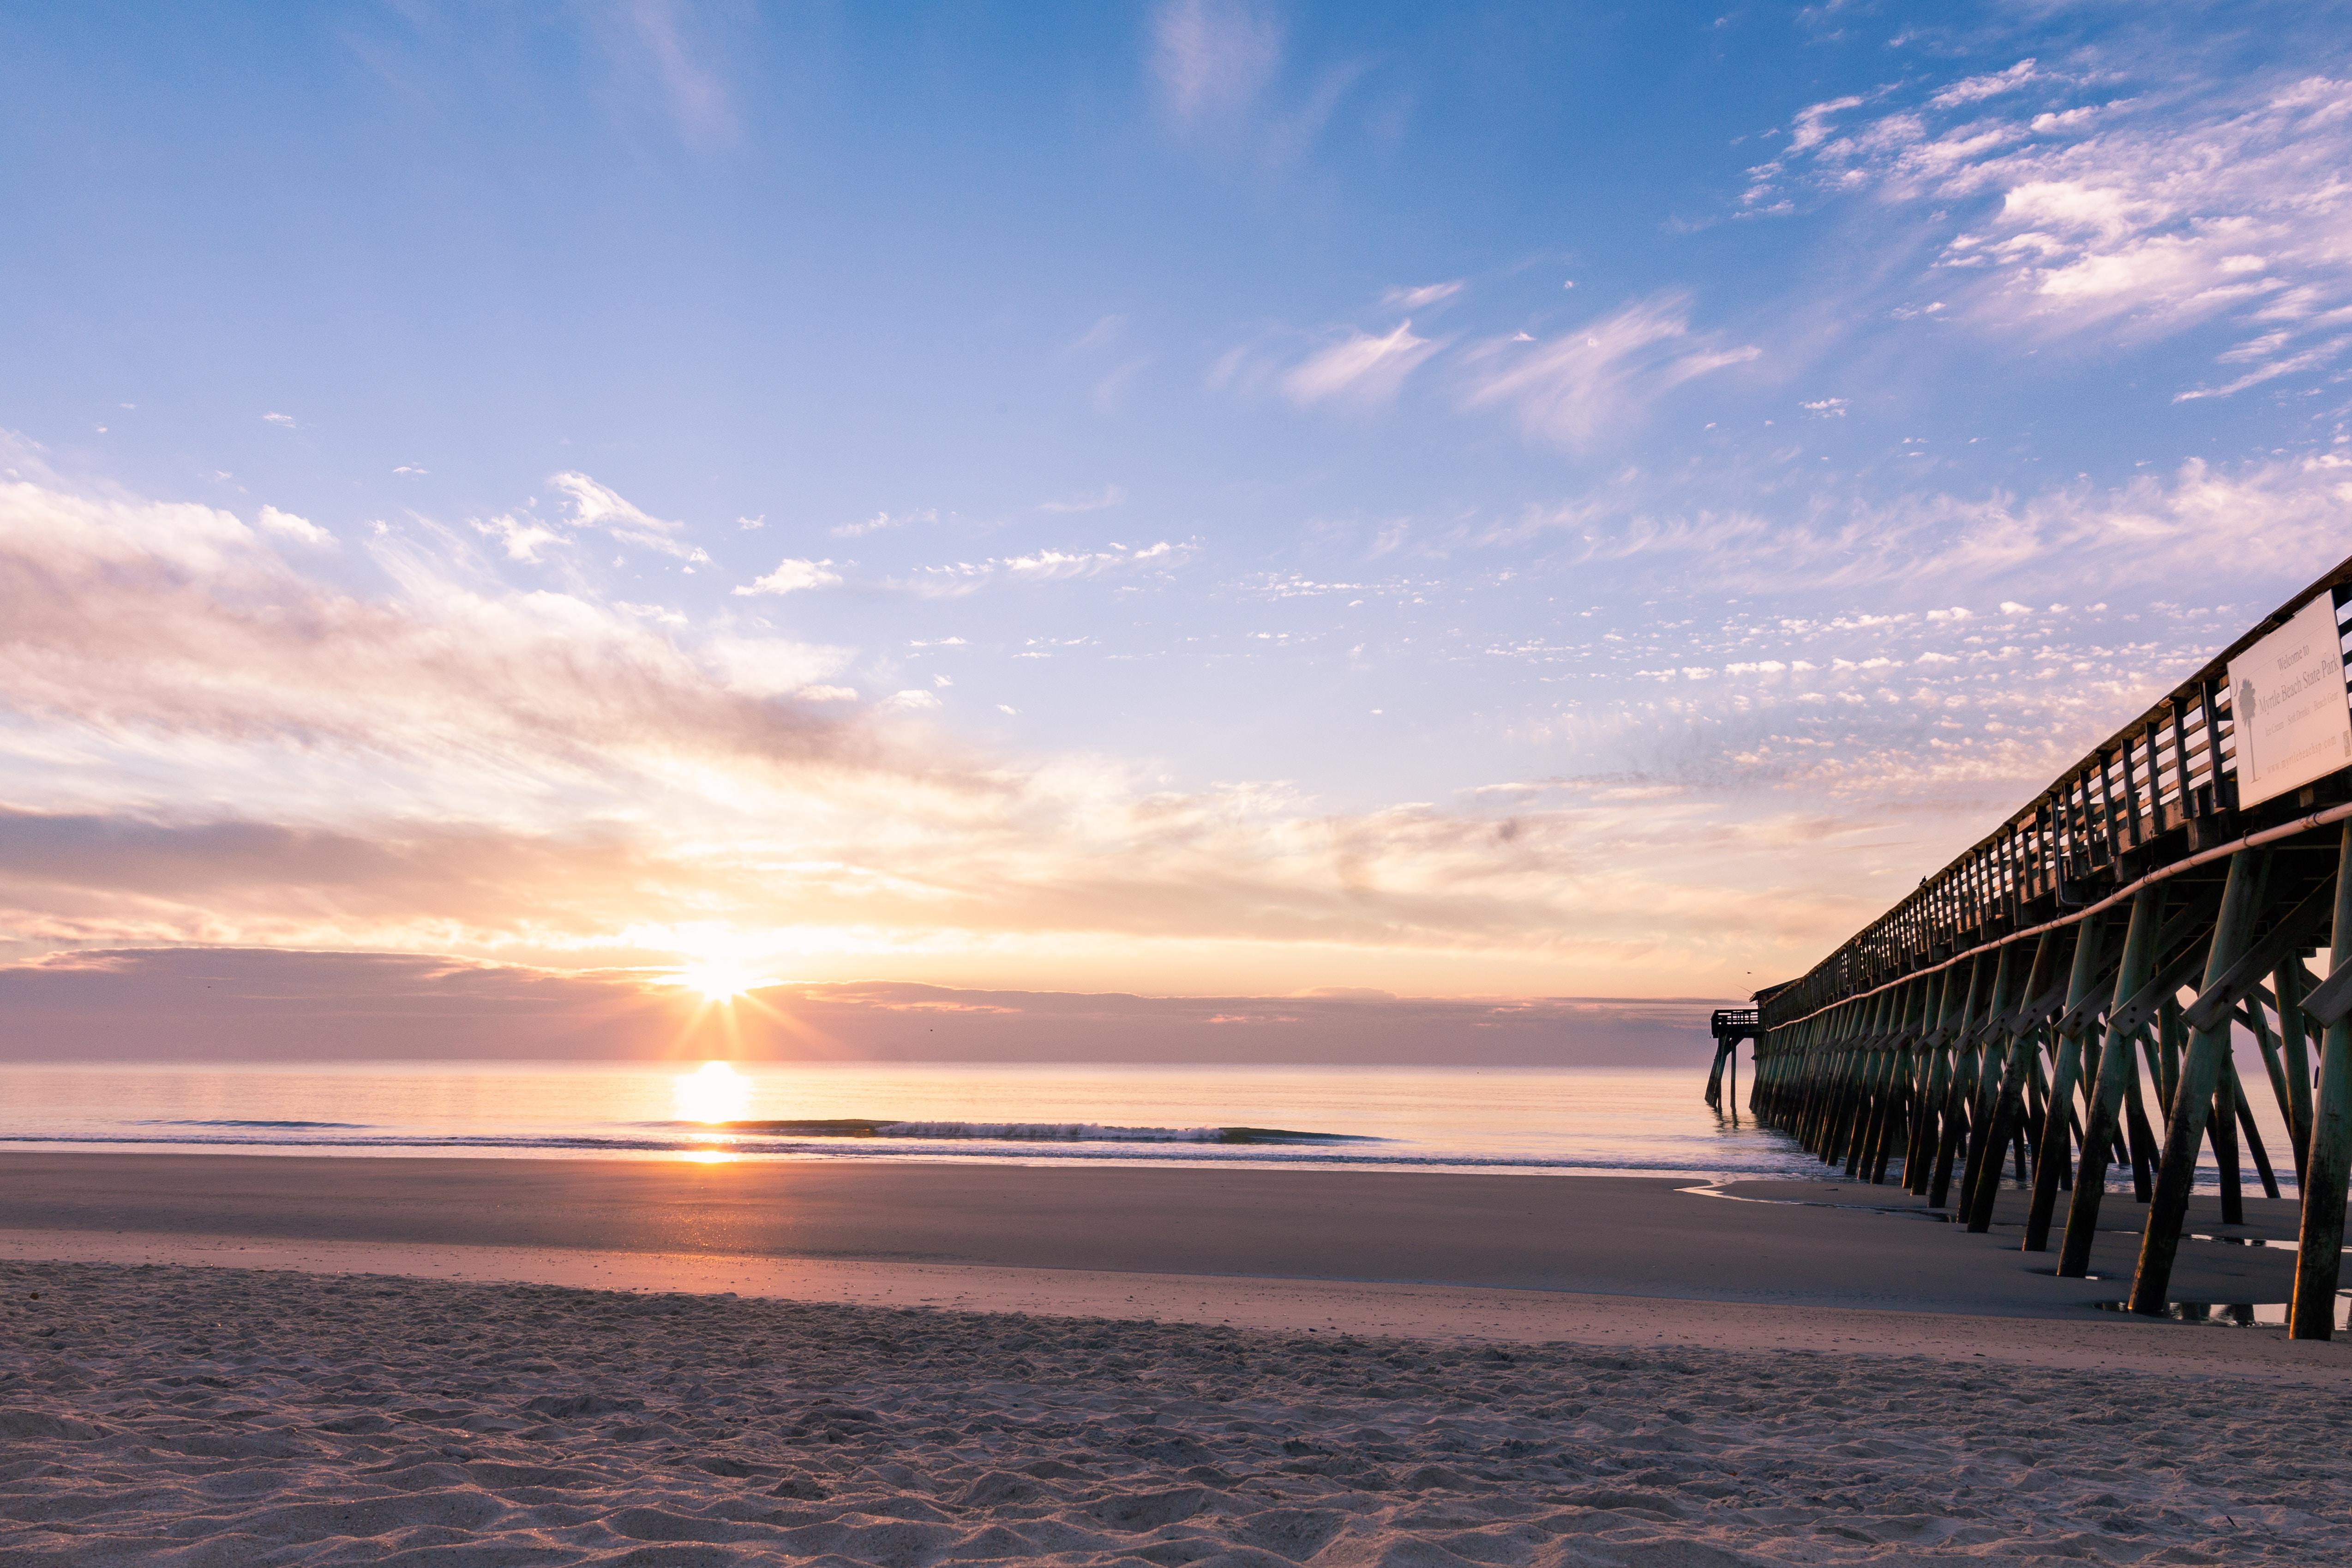 silhouette photography of black wooden dock near shoreline during sunrise